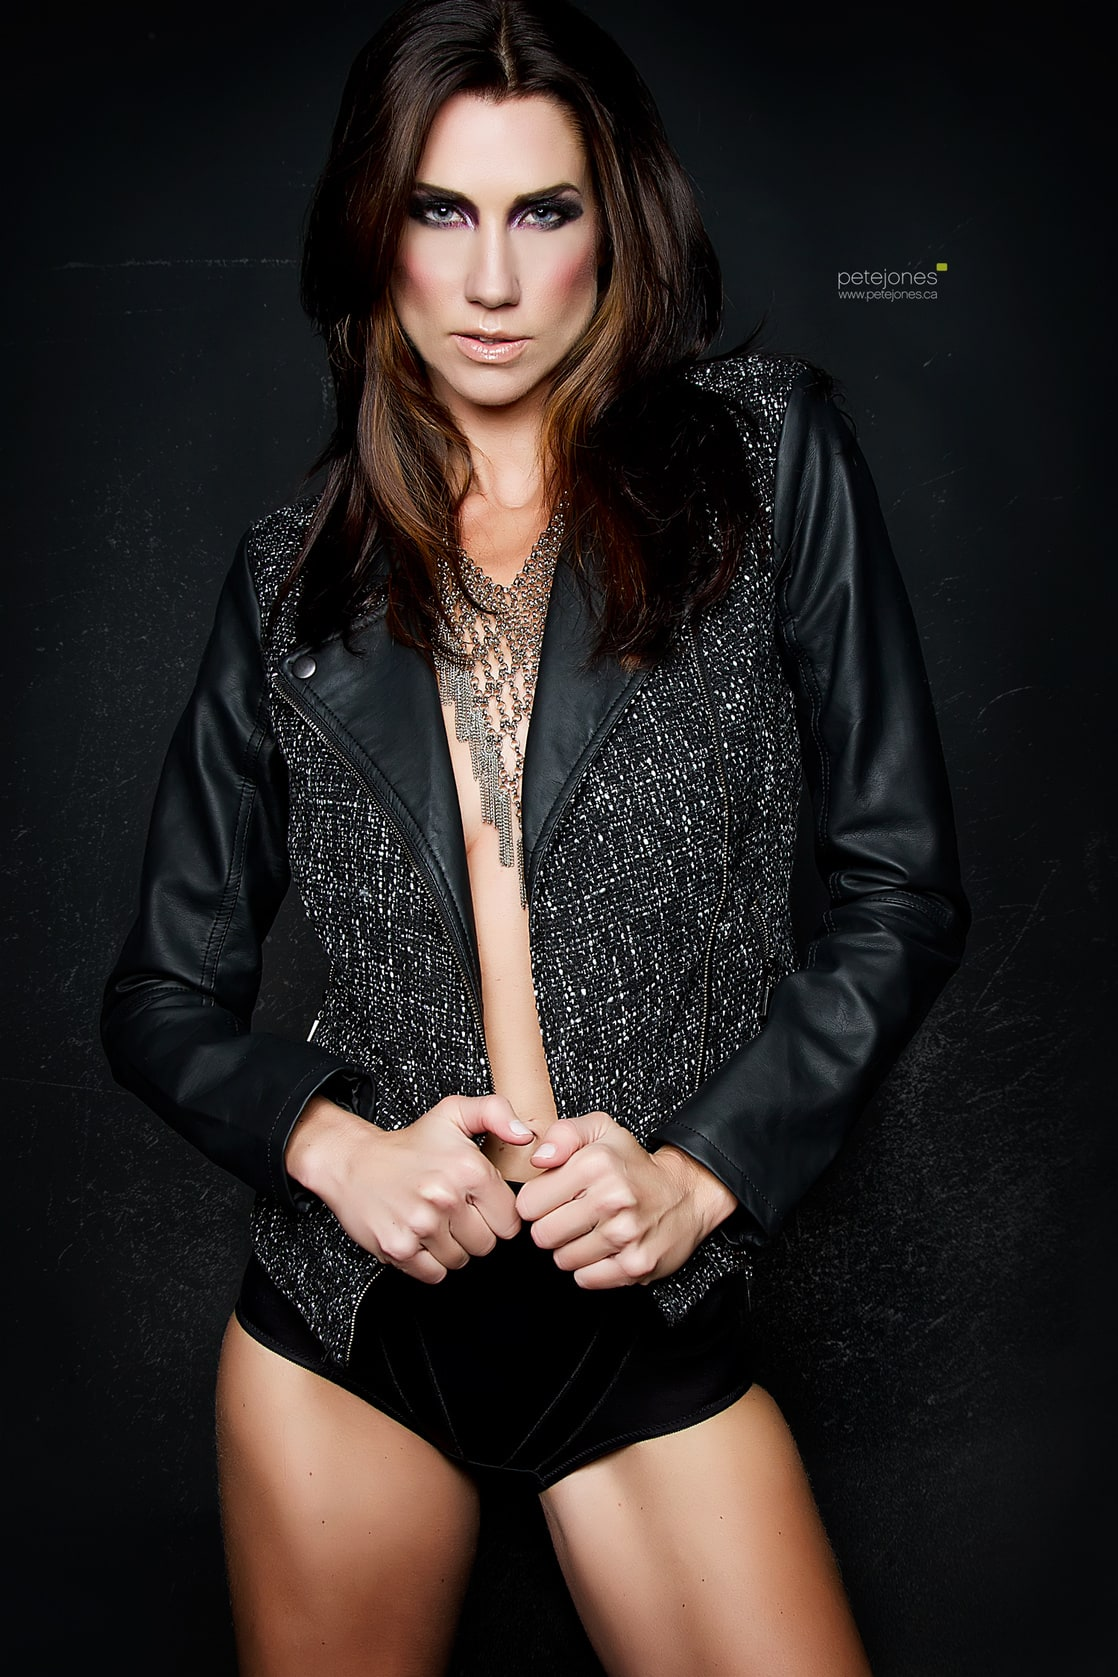 Katie phang attorney wikipedia images - Image Result For Tiara Sorensen